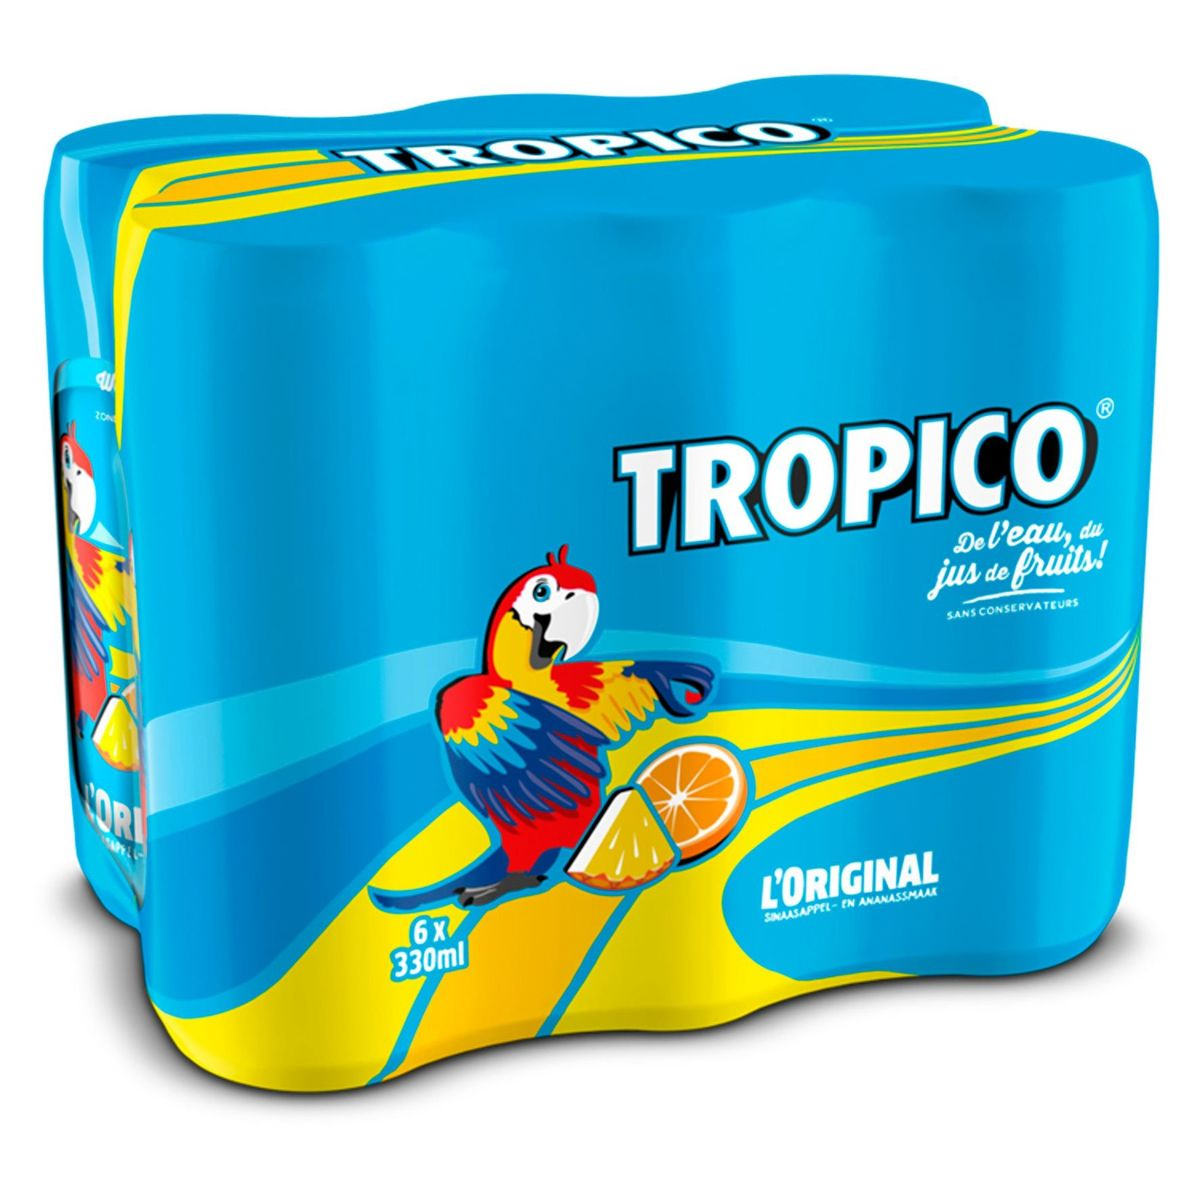 Tropico l'Original 6 x 330 ml